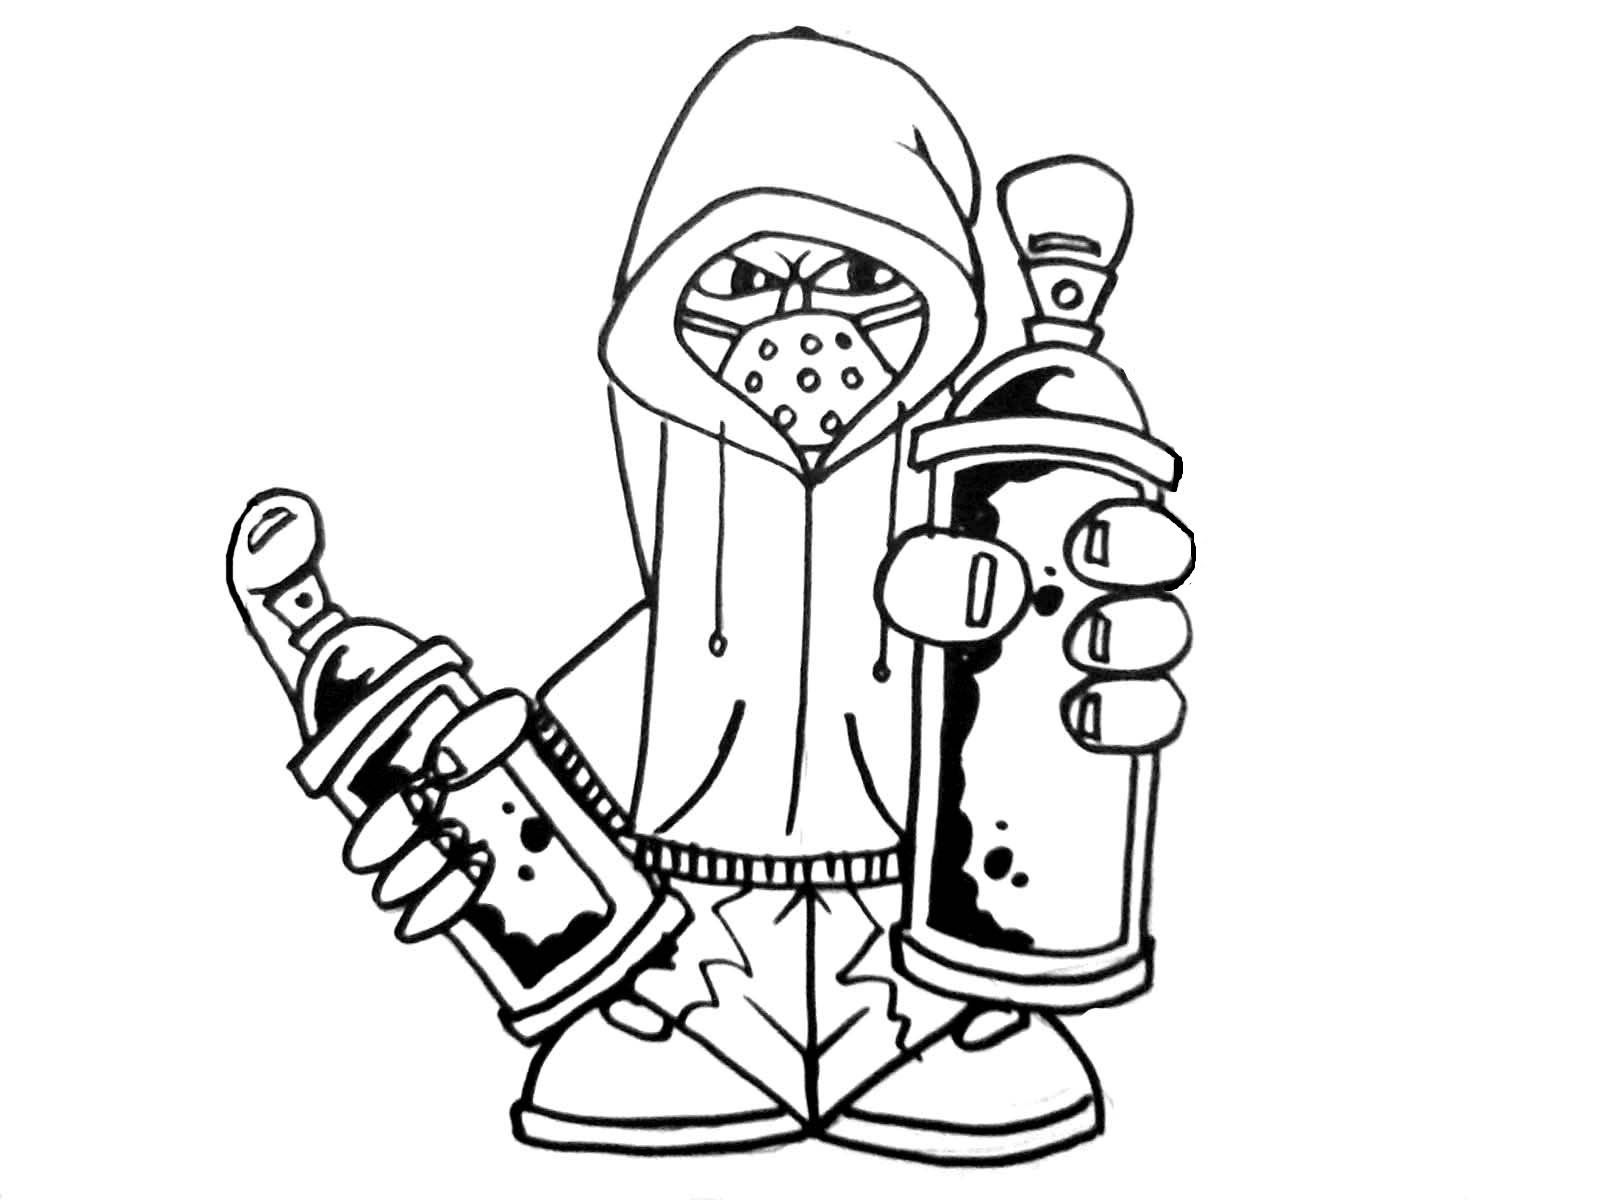 1600x1200 Cartoon Graffiti Gangster Characters How To Draw A Graffiti